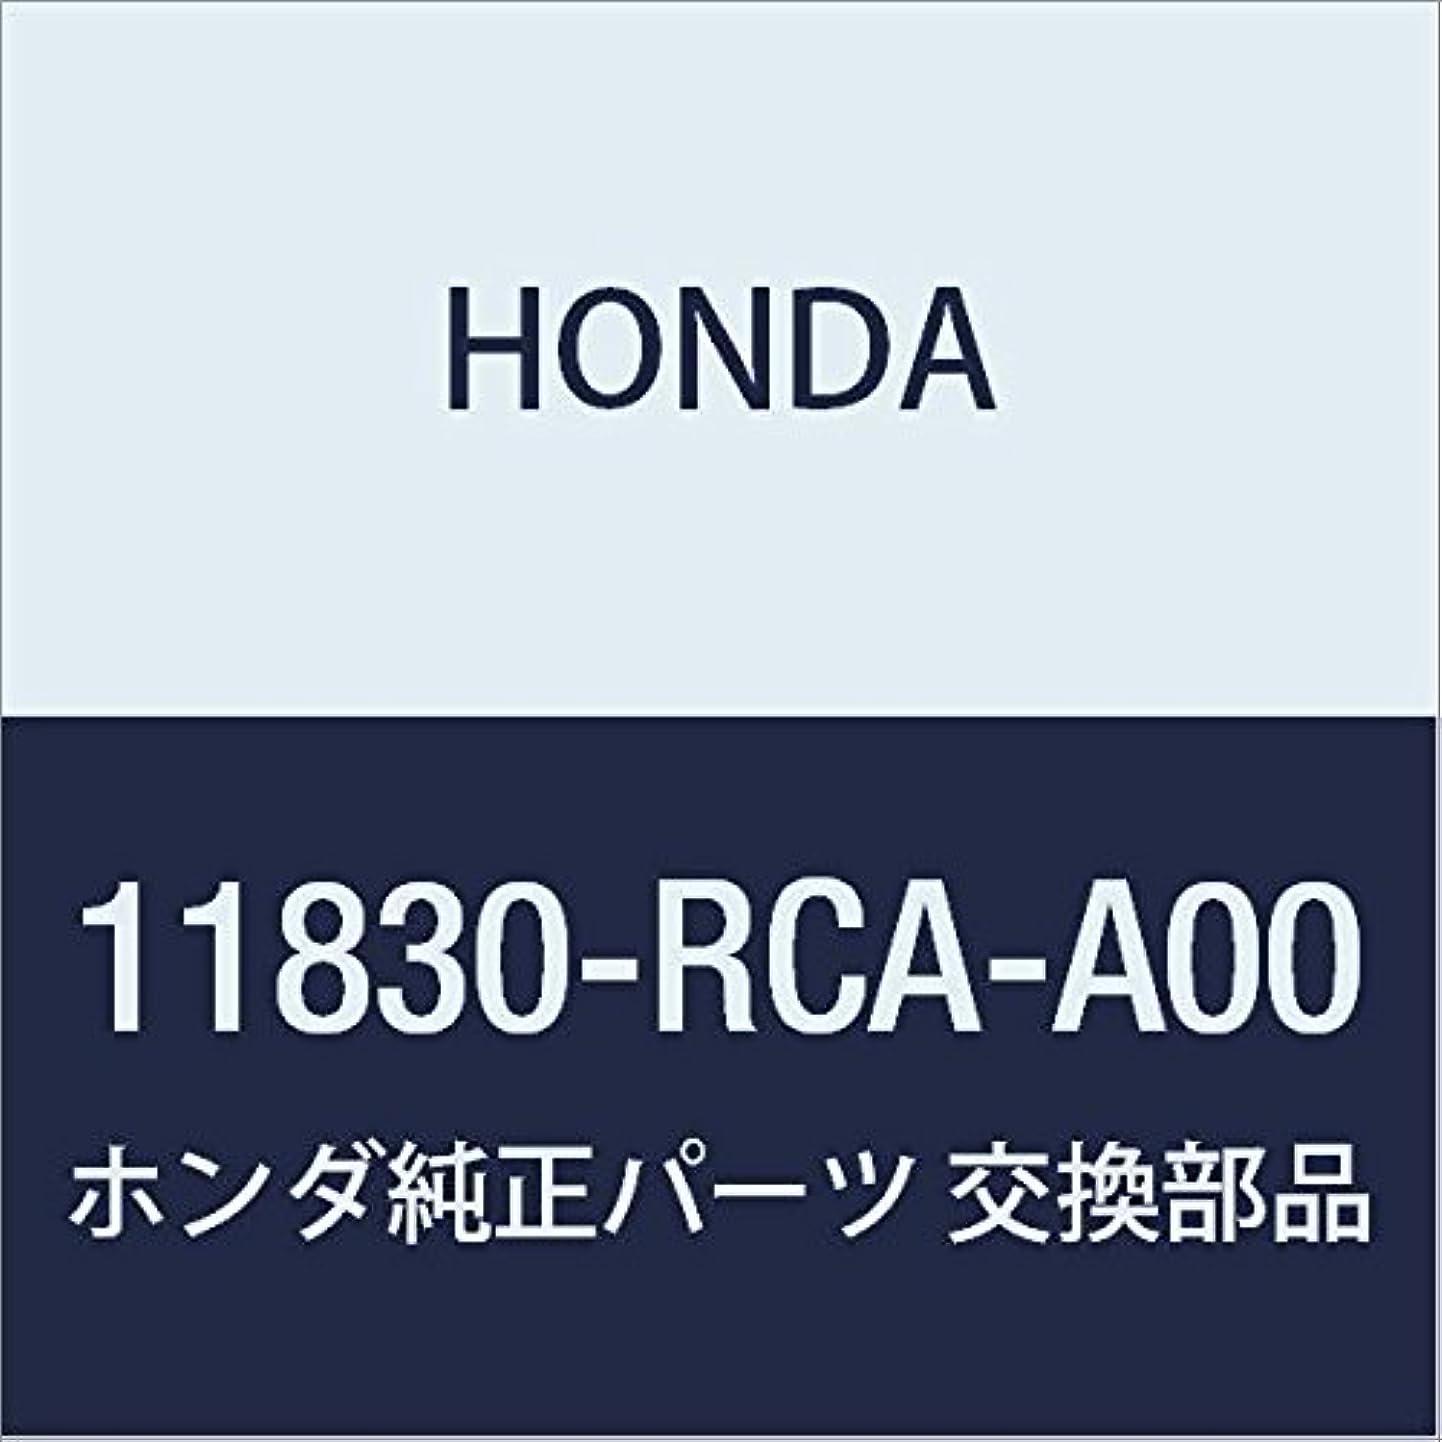 Genuine Honda 11830-RCA-A00 Timing Belt Cover Assembly sxvwenqbewo1